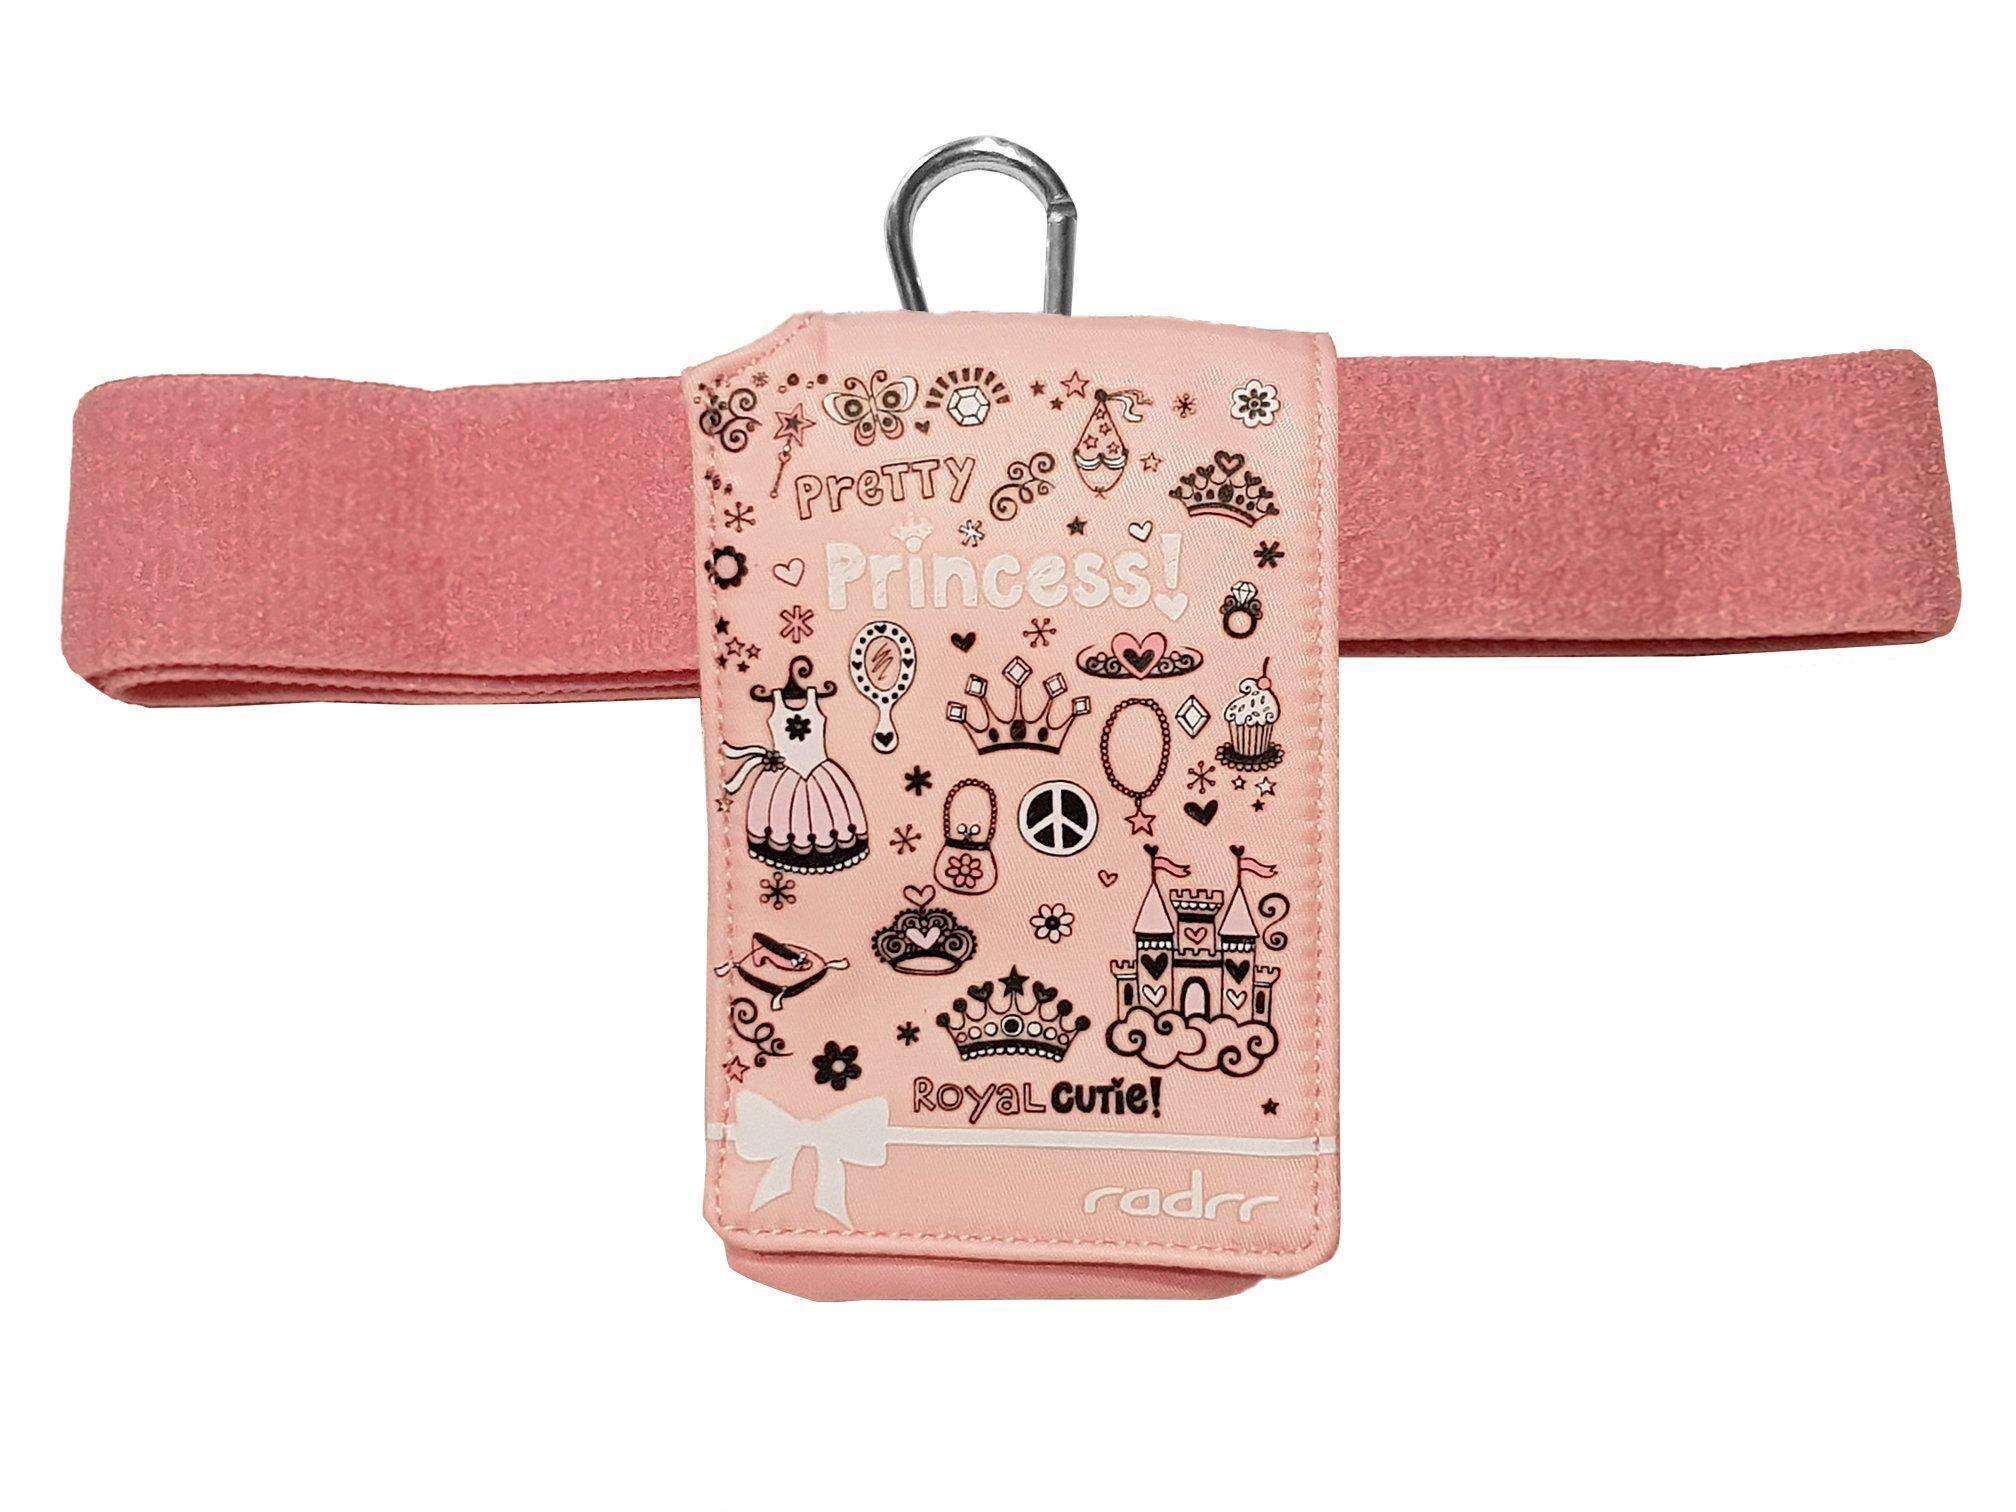 Insulin Pump Universal Case - Pink Princess Design with Belt by radrr